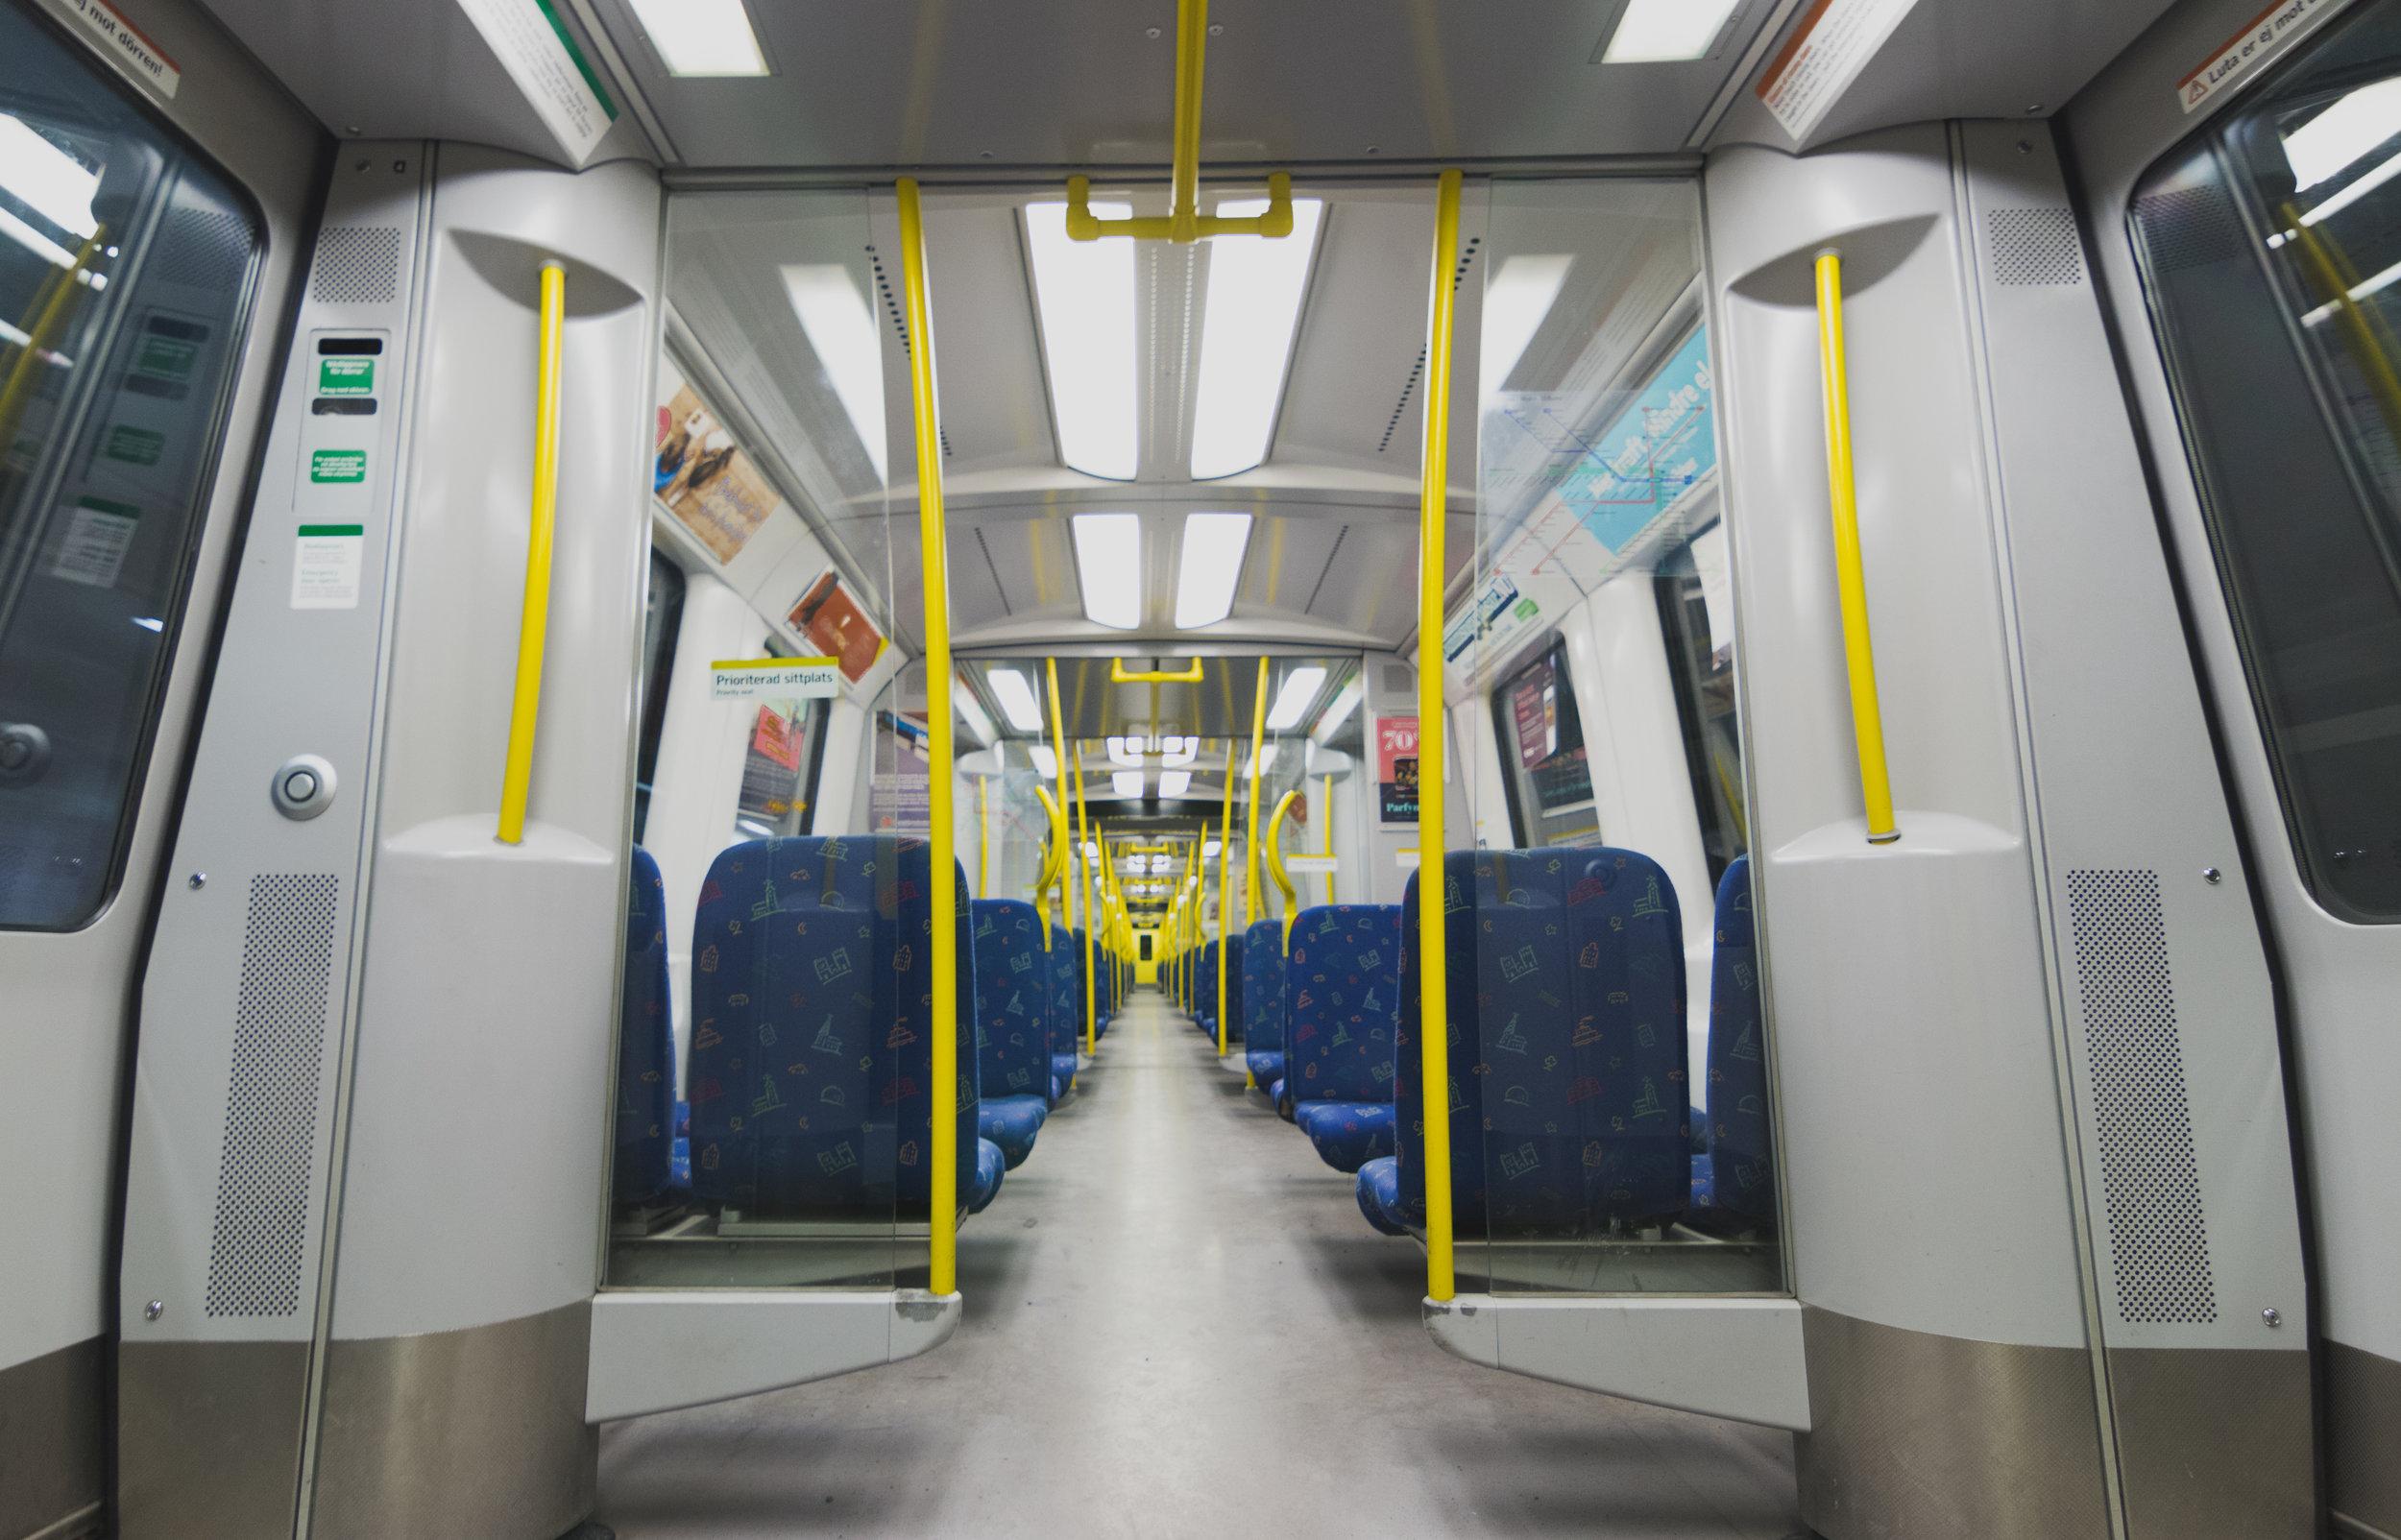 Tunnelbana+Stockholm+Krönika